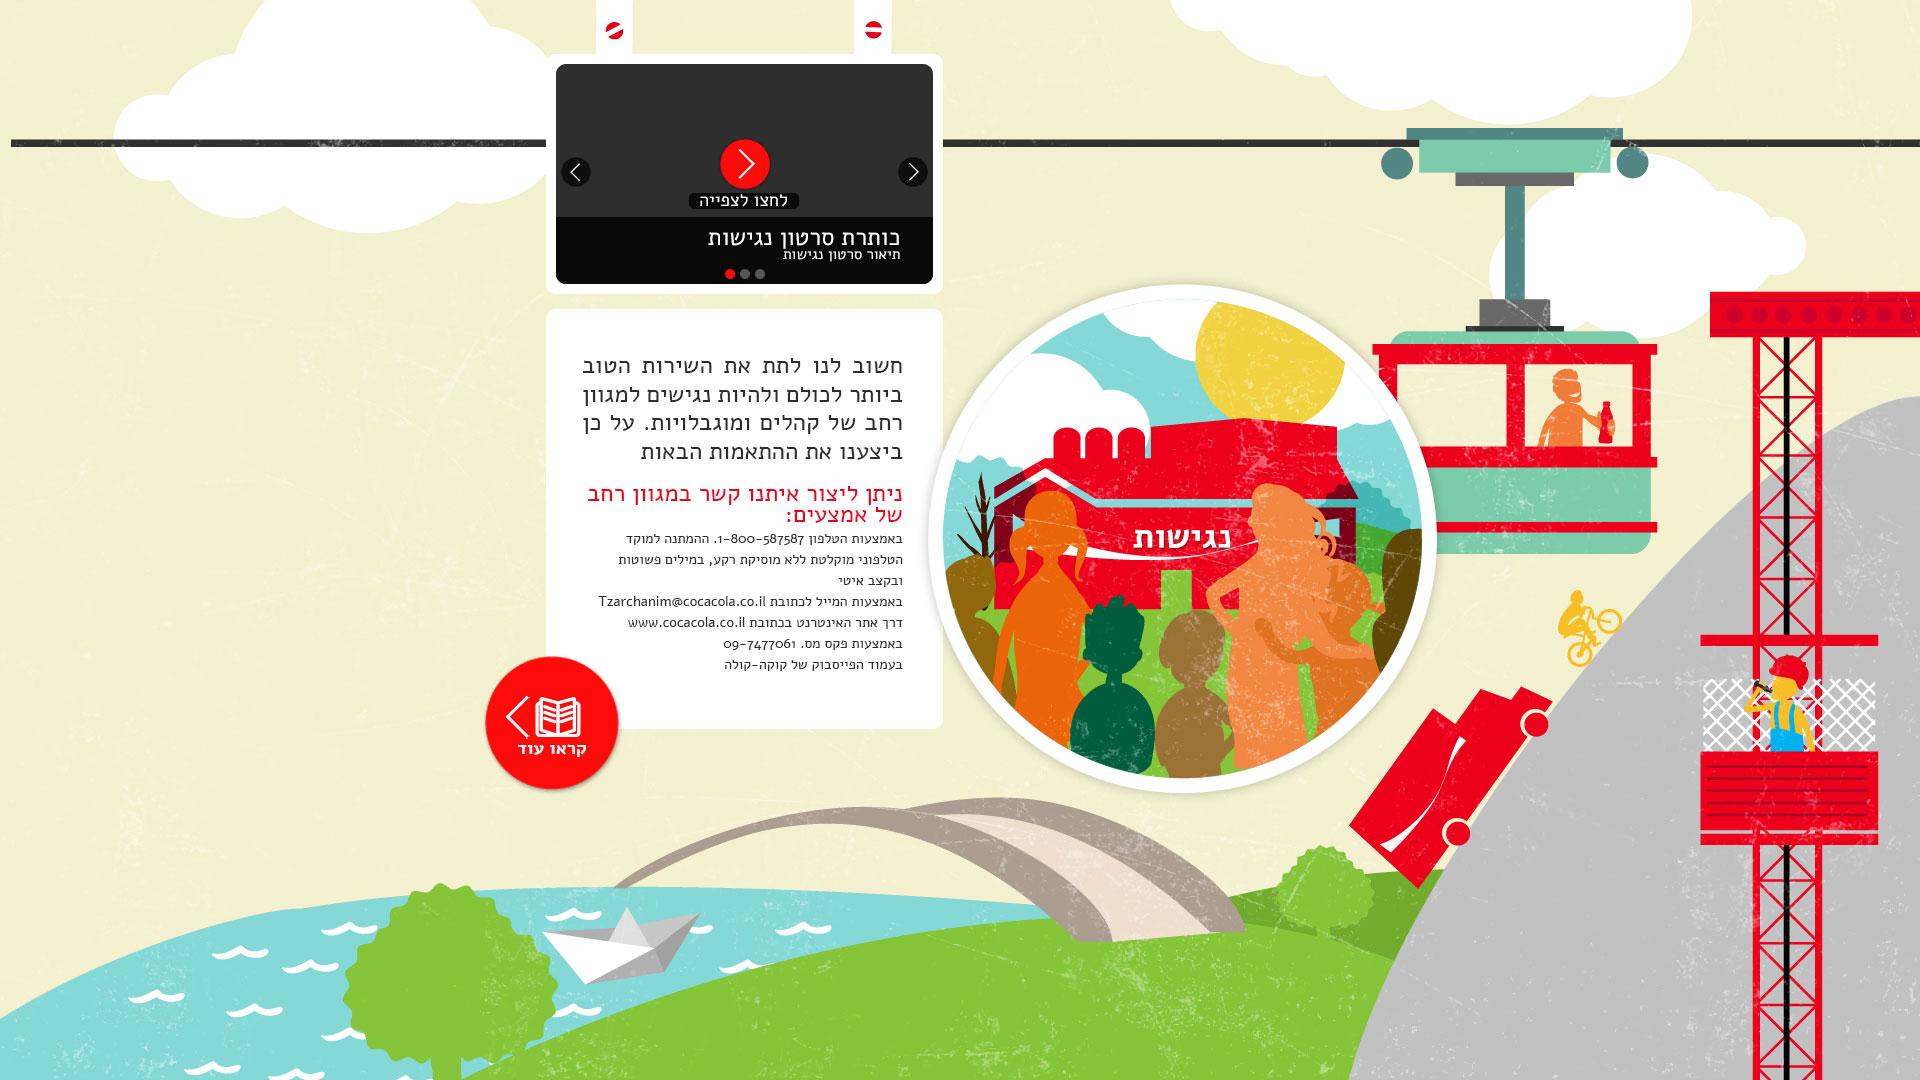 Coca Cola social responsibility website design קוקה קולה עיצוב אתר אחריות חברתית 9